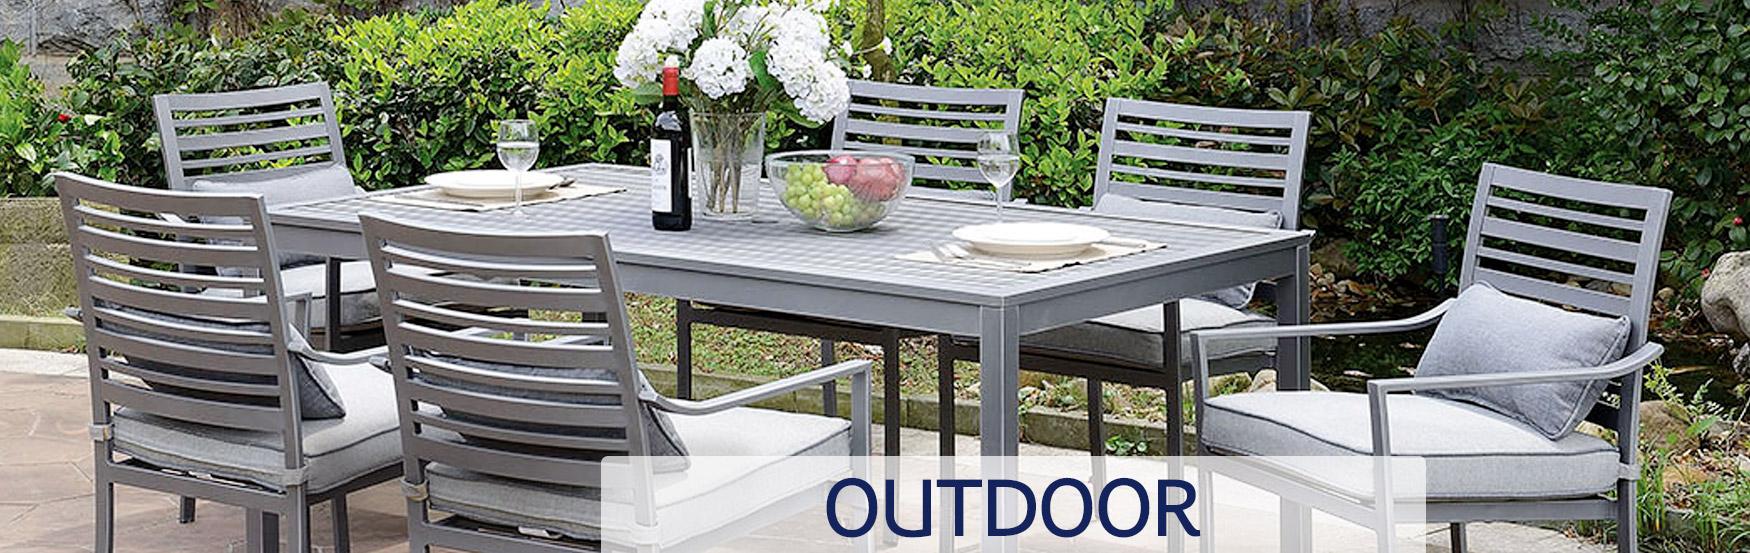 Outdoor Furniture Banner